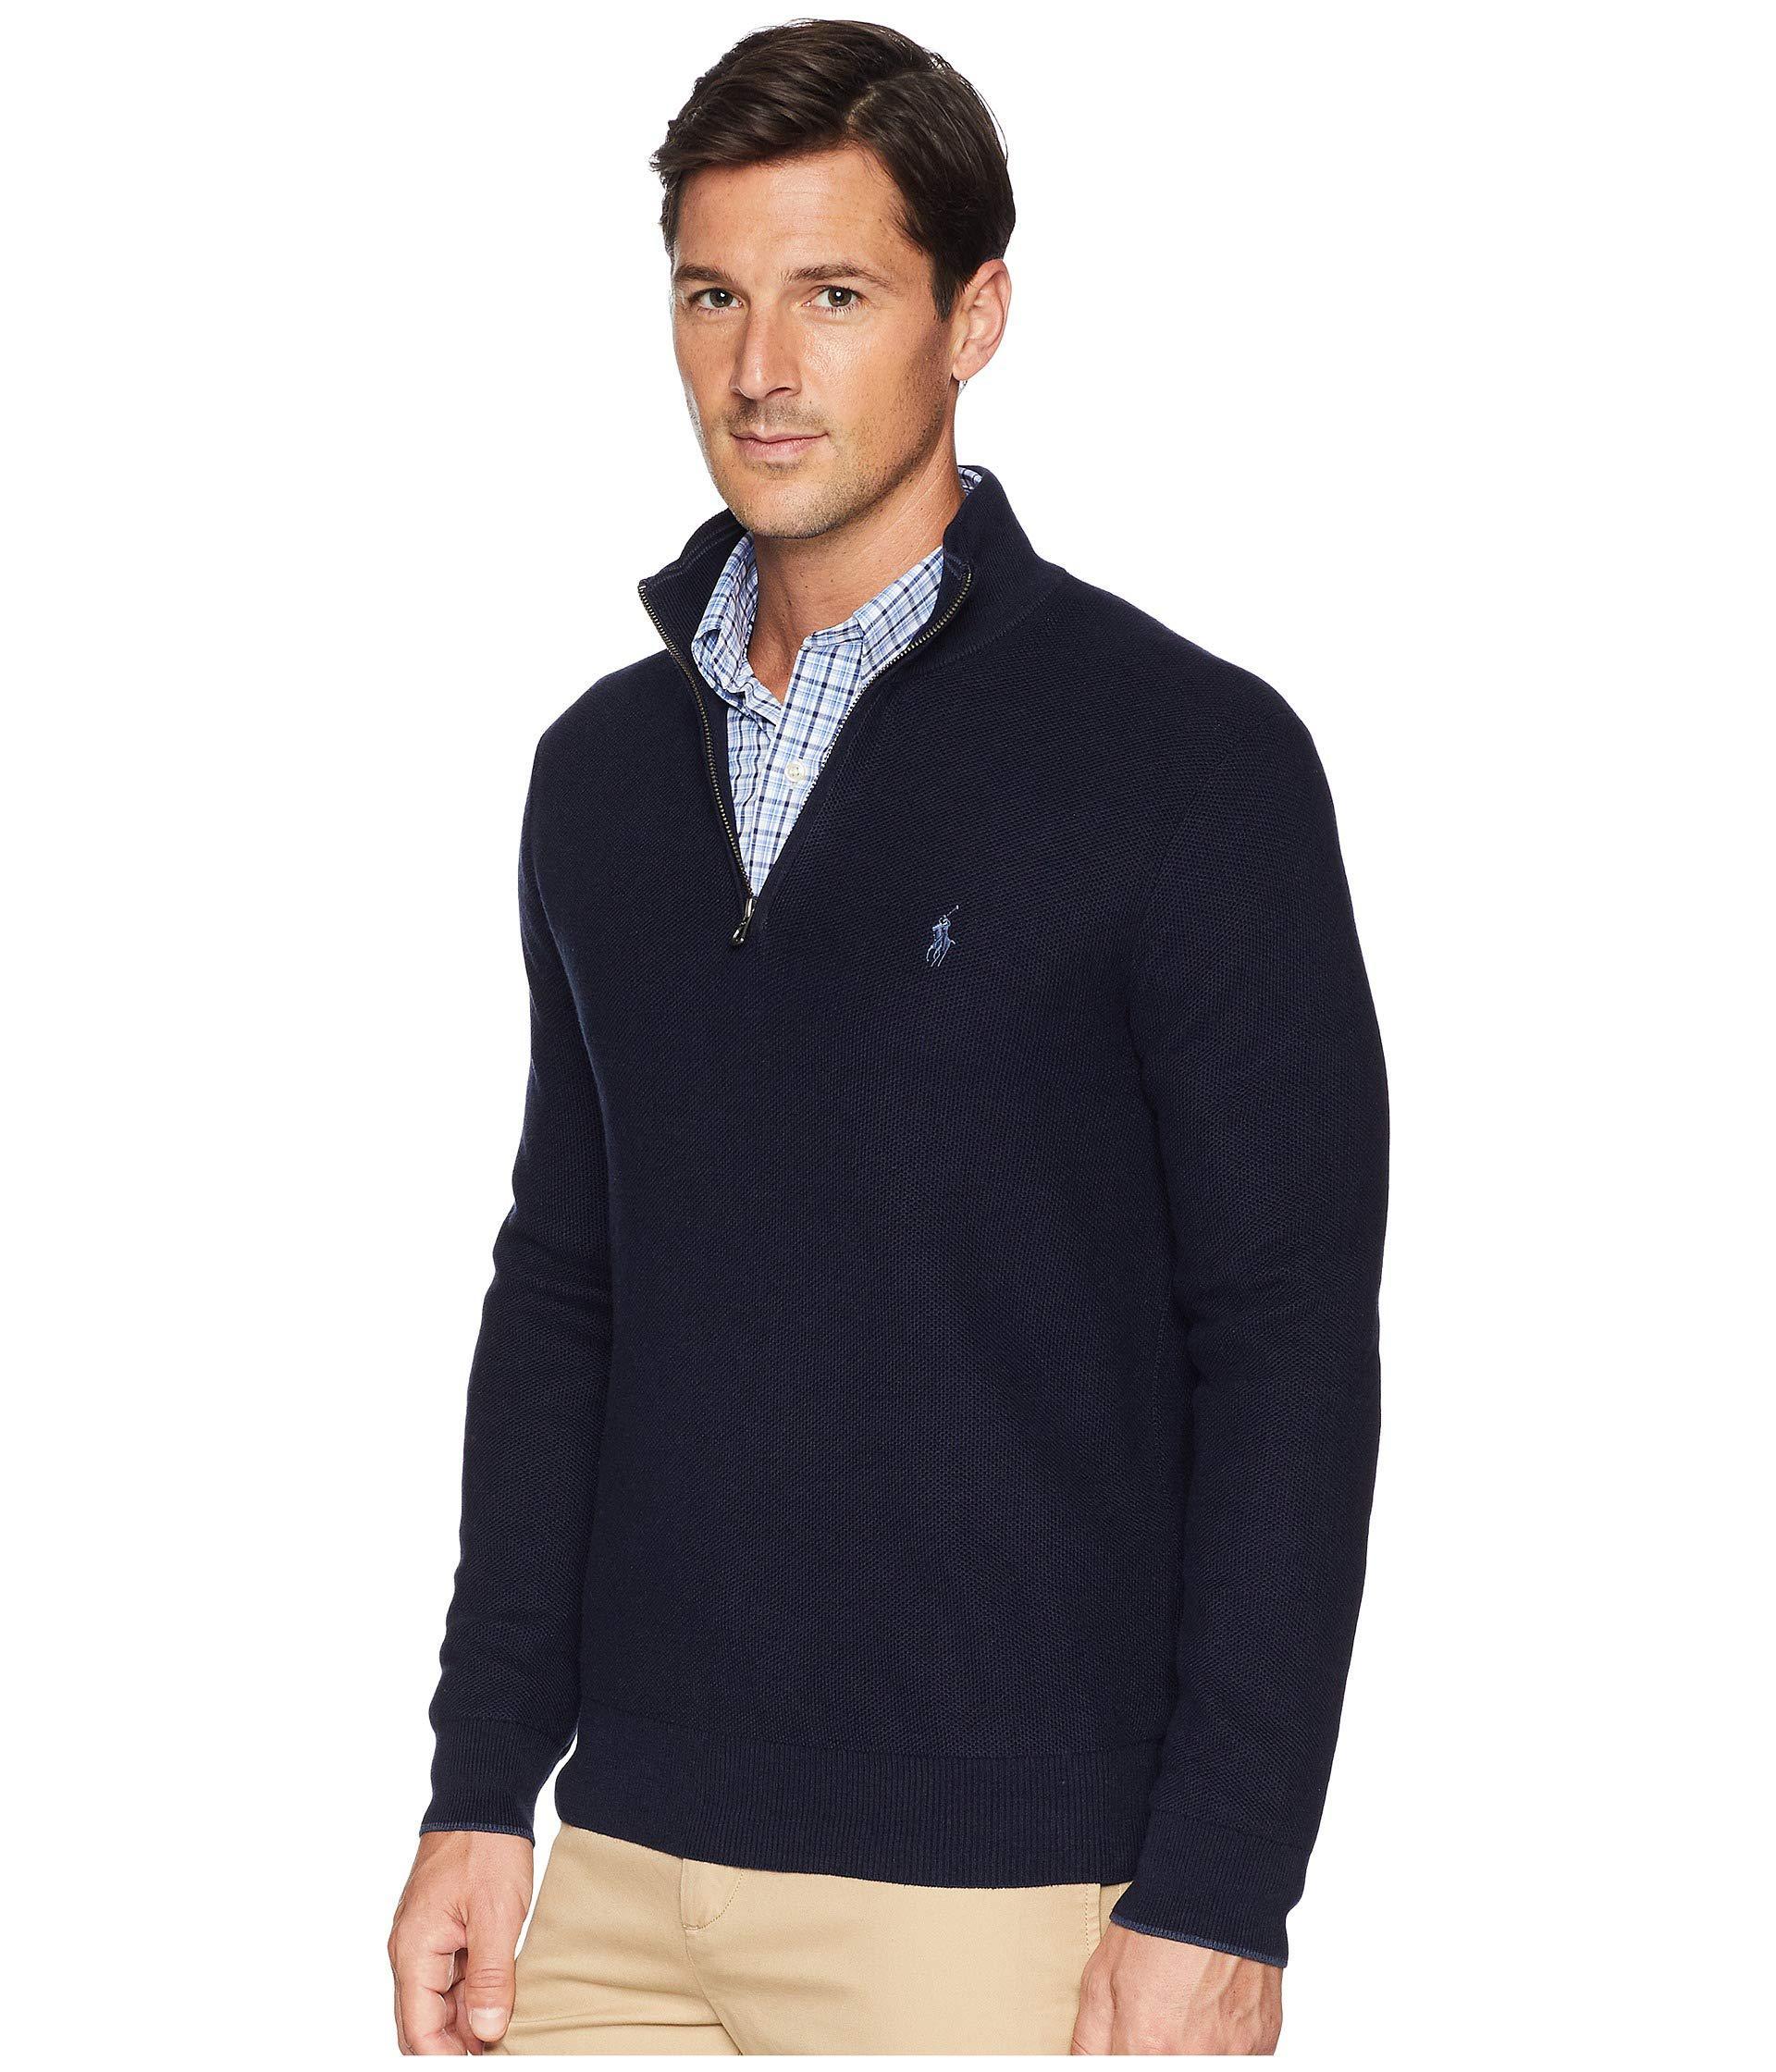 Lyst - Polo Ralph Lauren Textured Pique 1 2 Zip (oatmeal Heather) Men s  Sweater in Blue for Men 531b13faf898